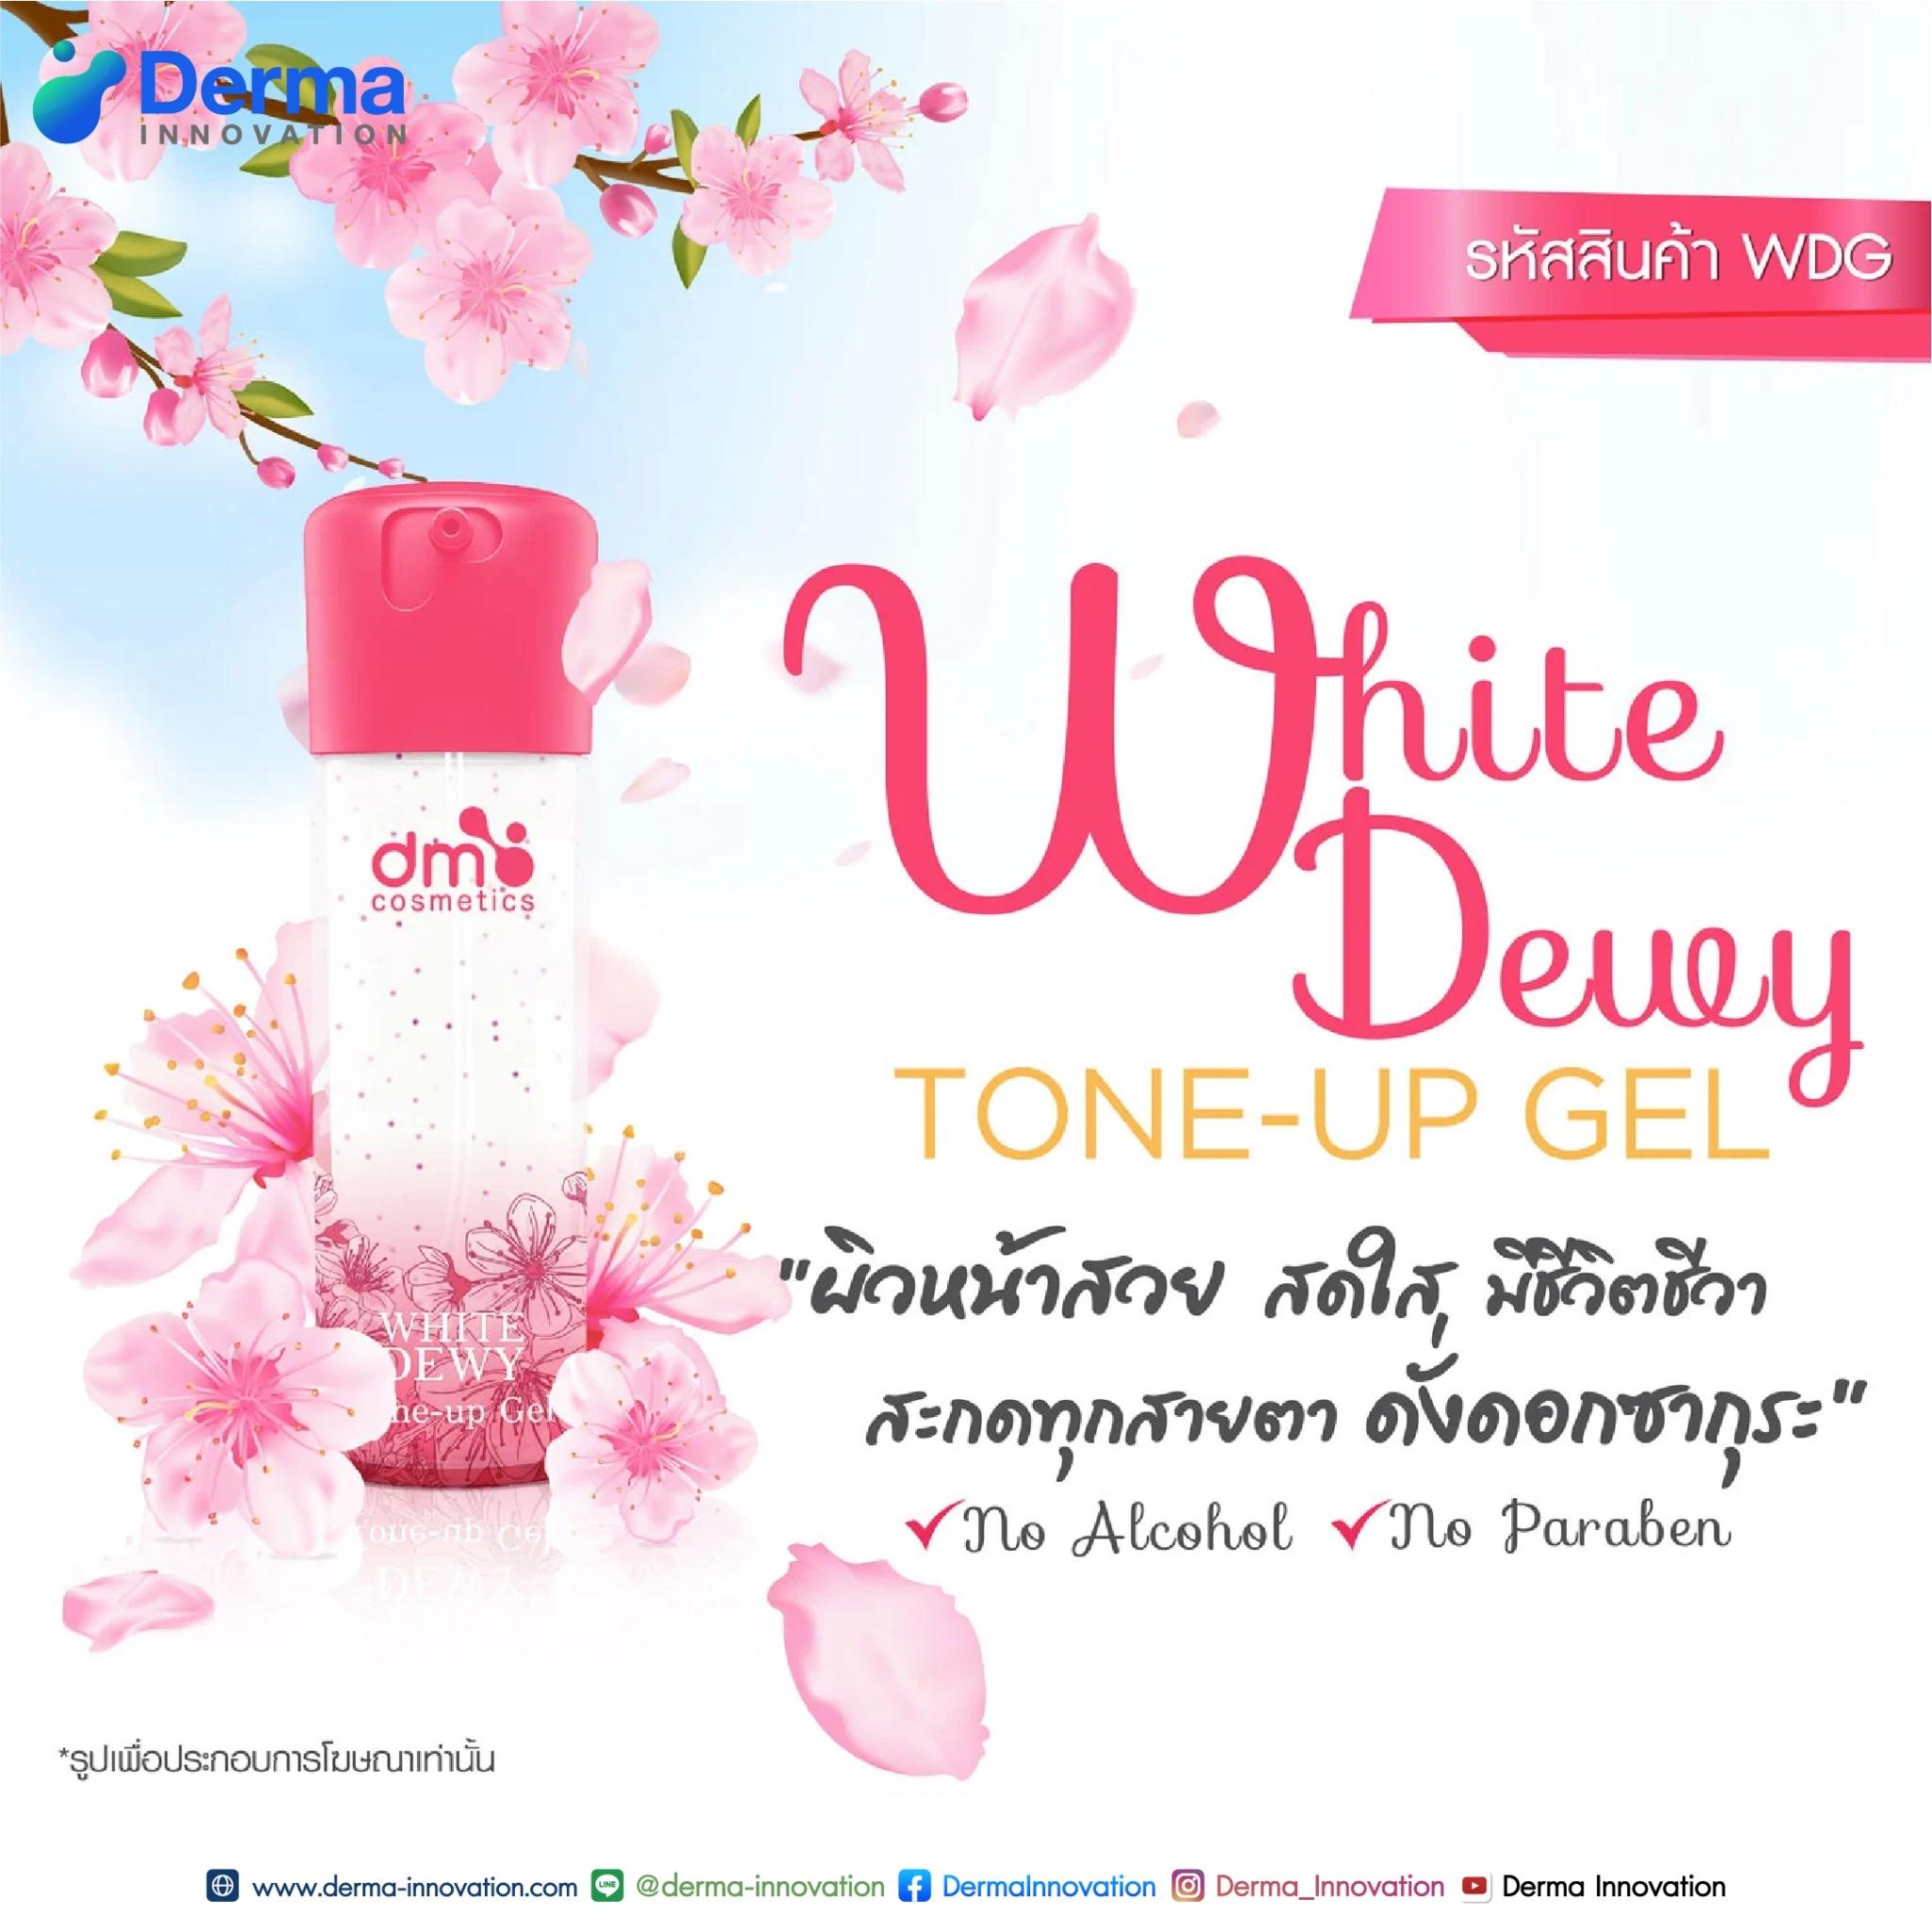 White Dewy Tone-up Gel